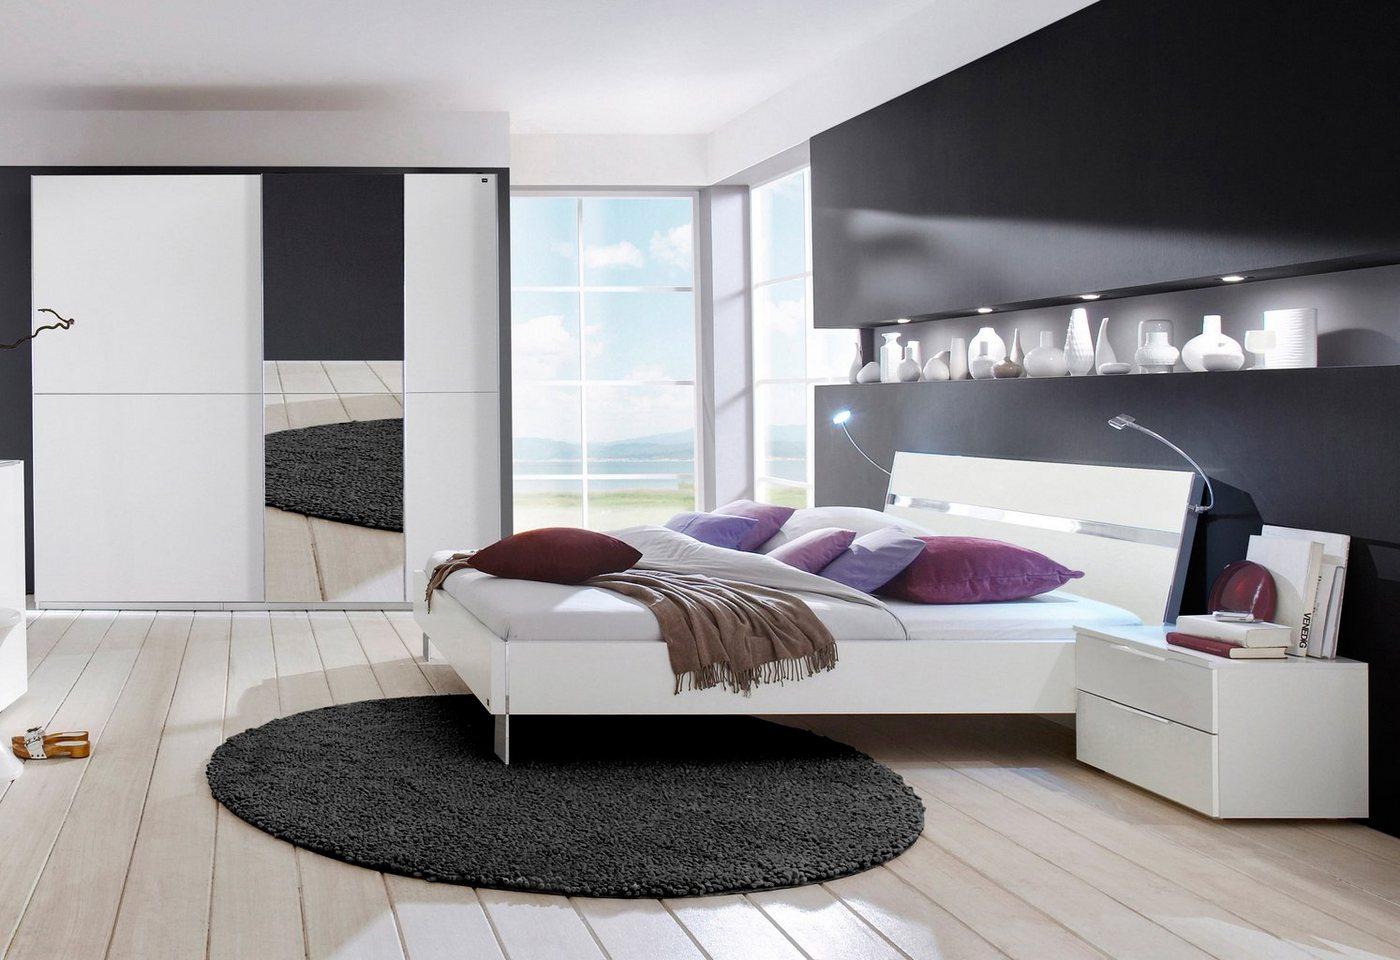 FRESH TO GO slaapkamermeubelen in 4-delige set, made in Germany